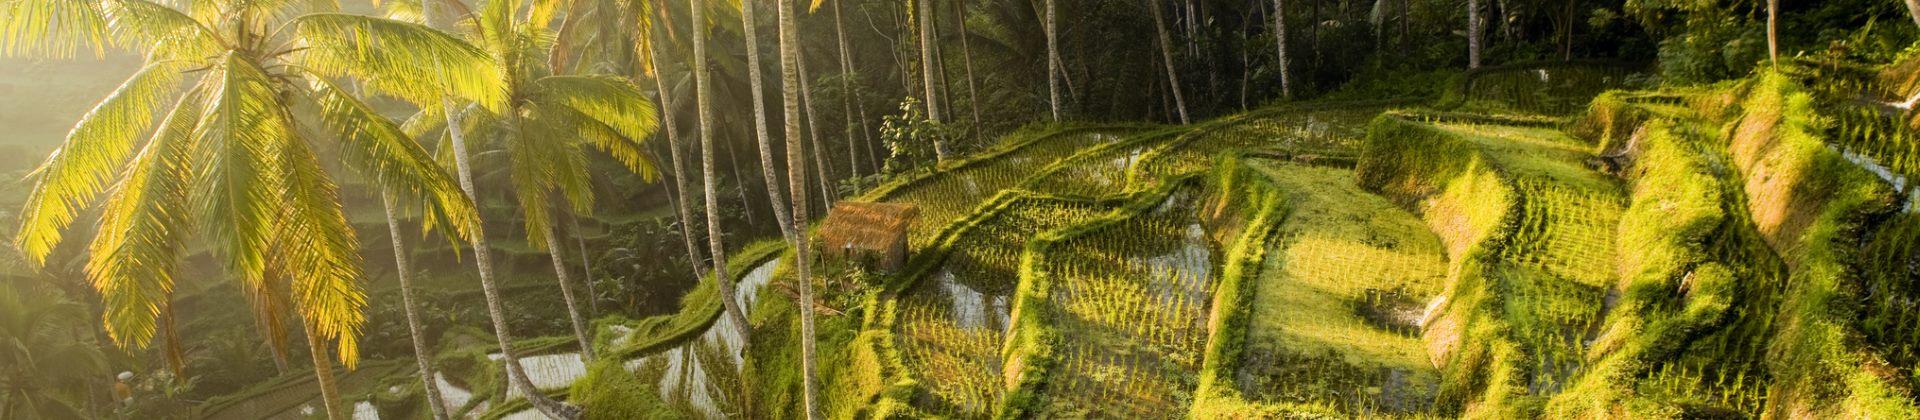 Rijstterassen op Bali